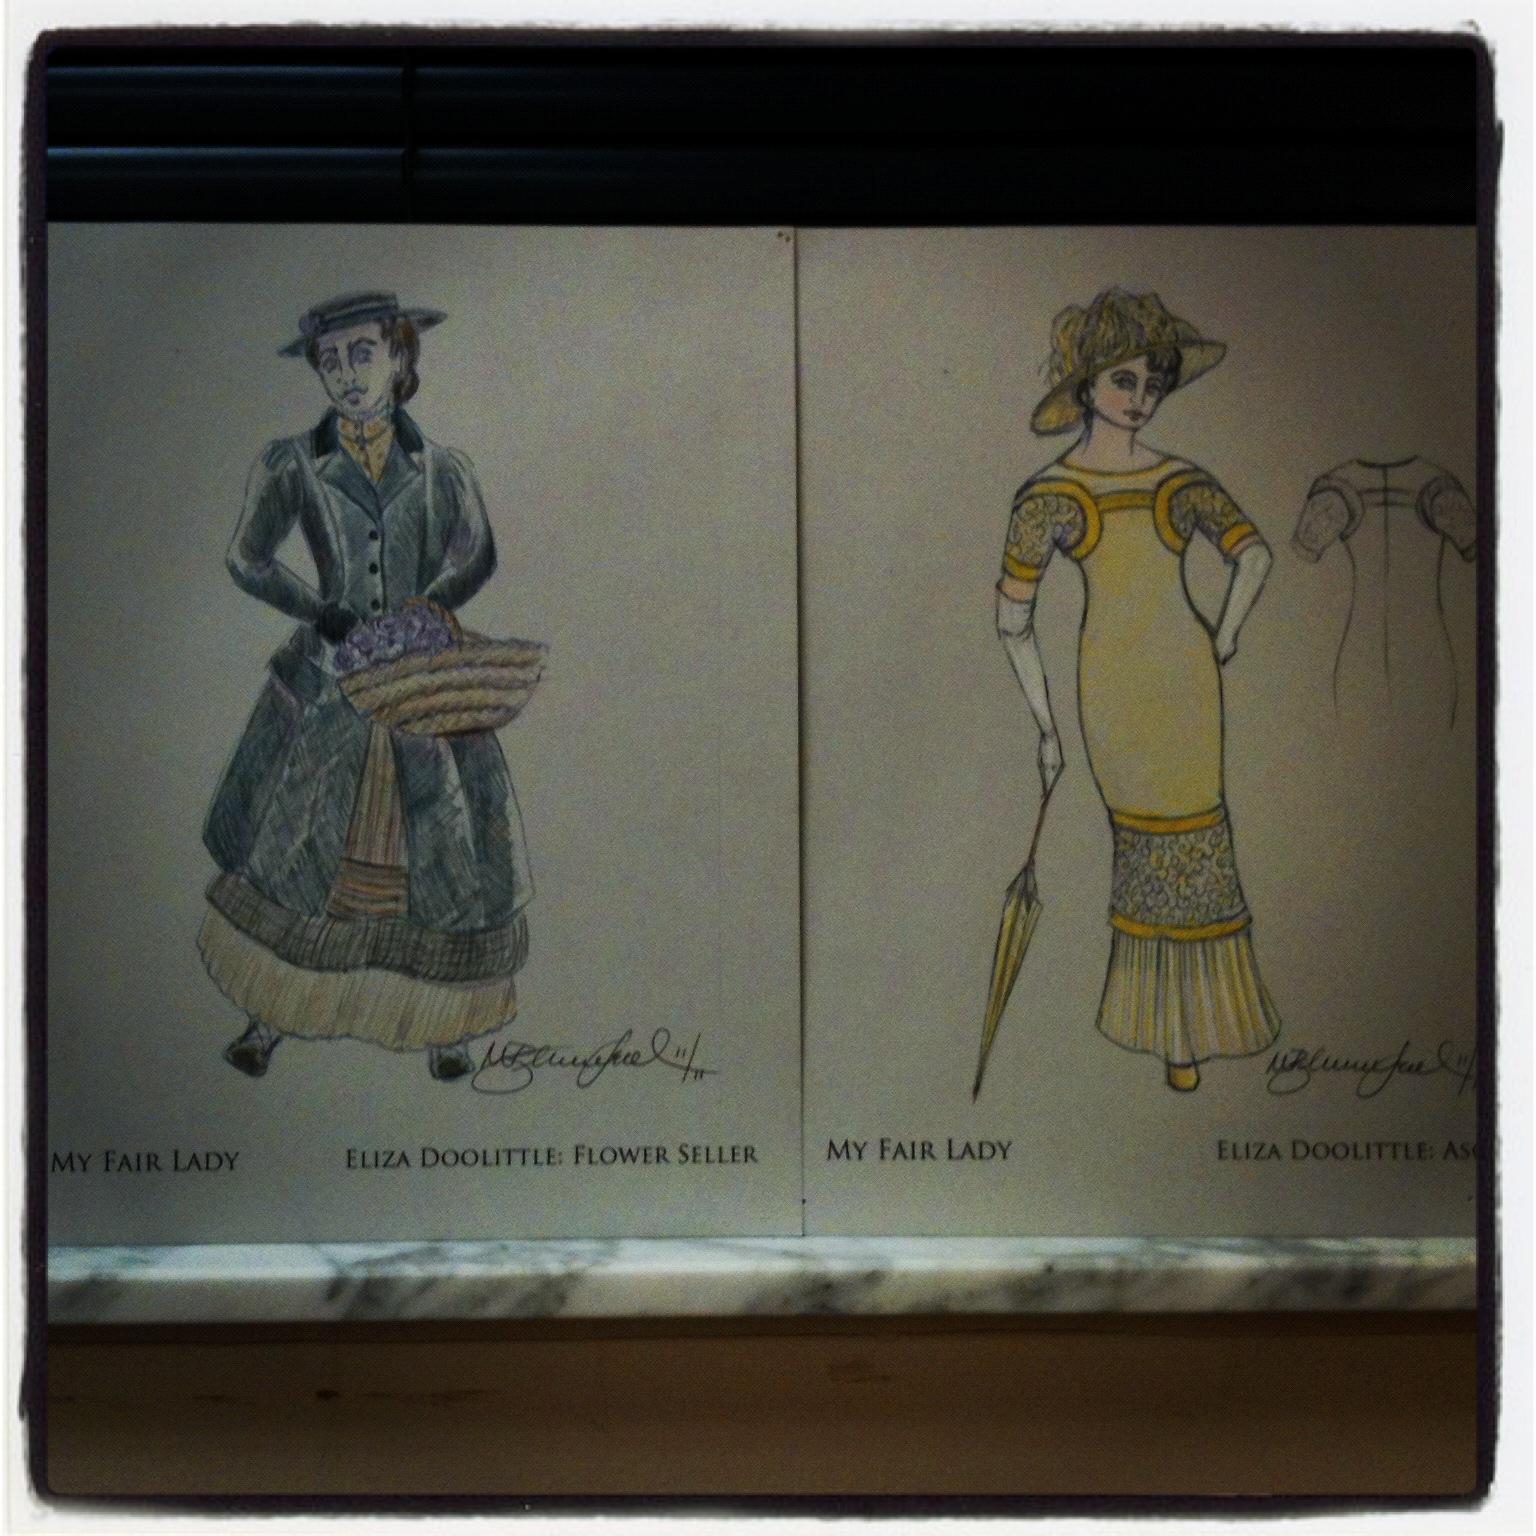 costume-design-by-mara-bluemenfeld_18574586995_o.jpg